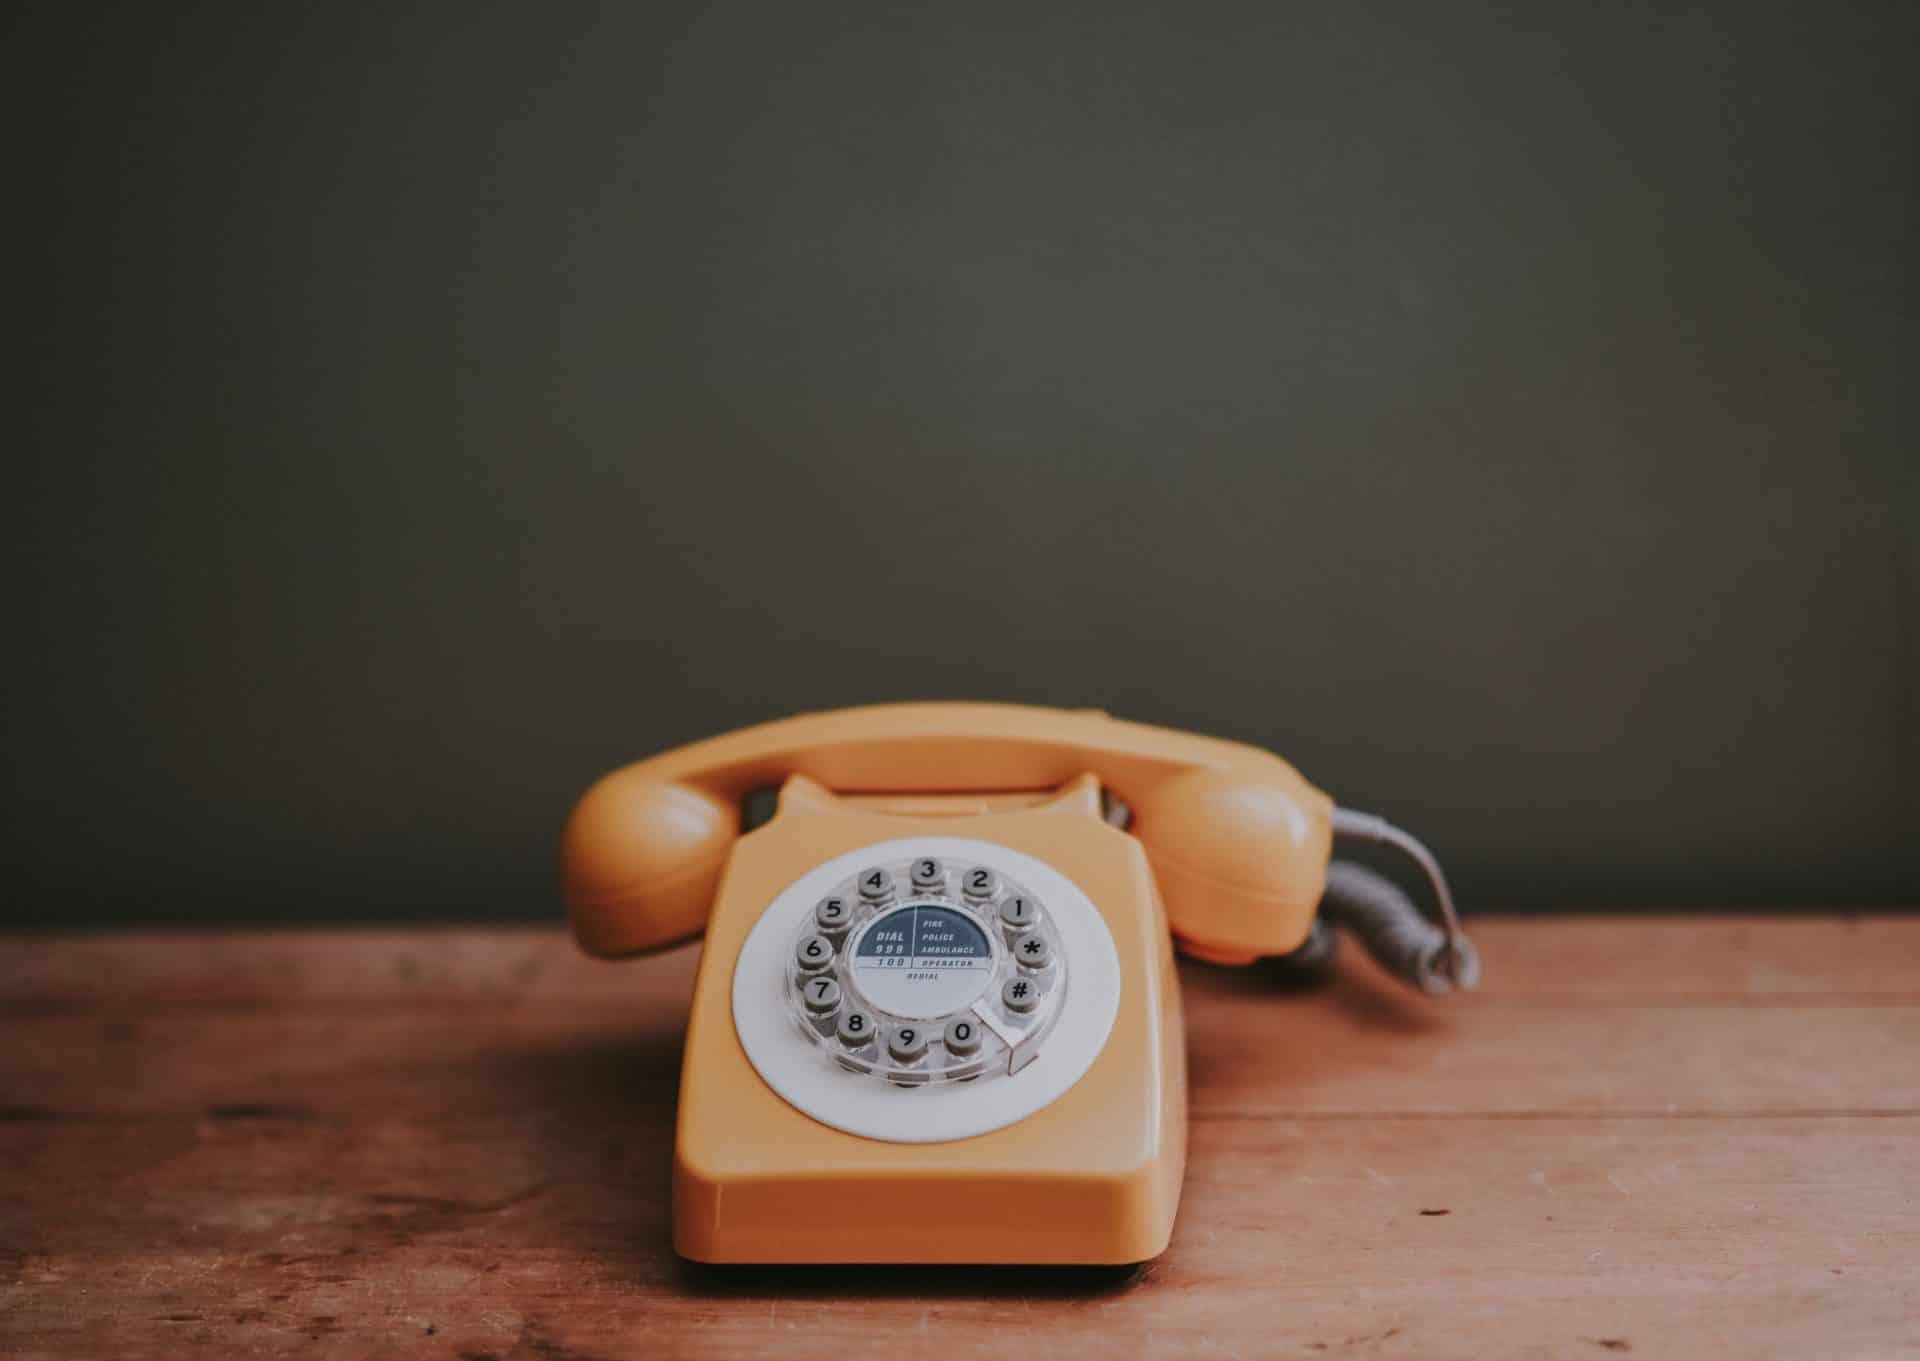 telephone calls in Russia